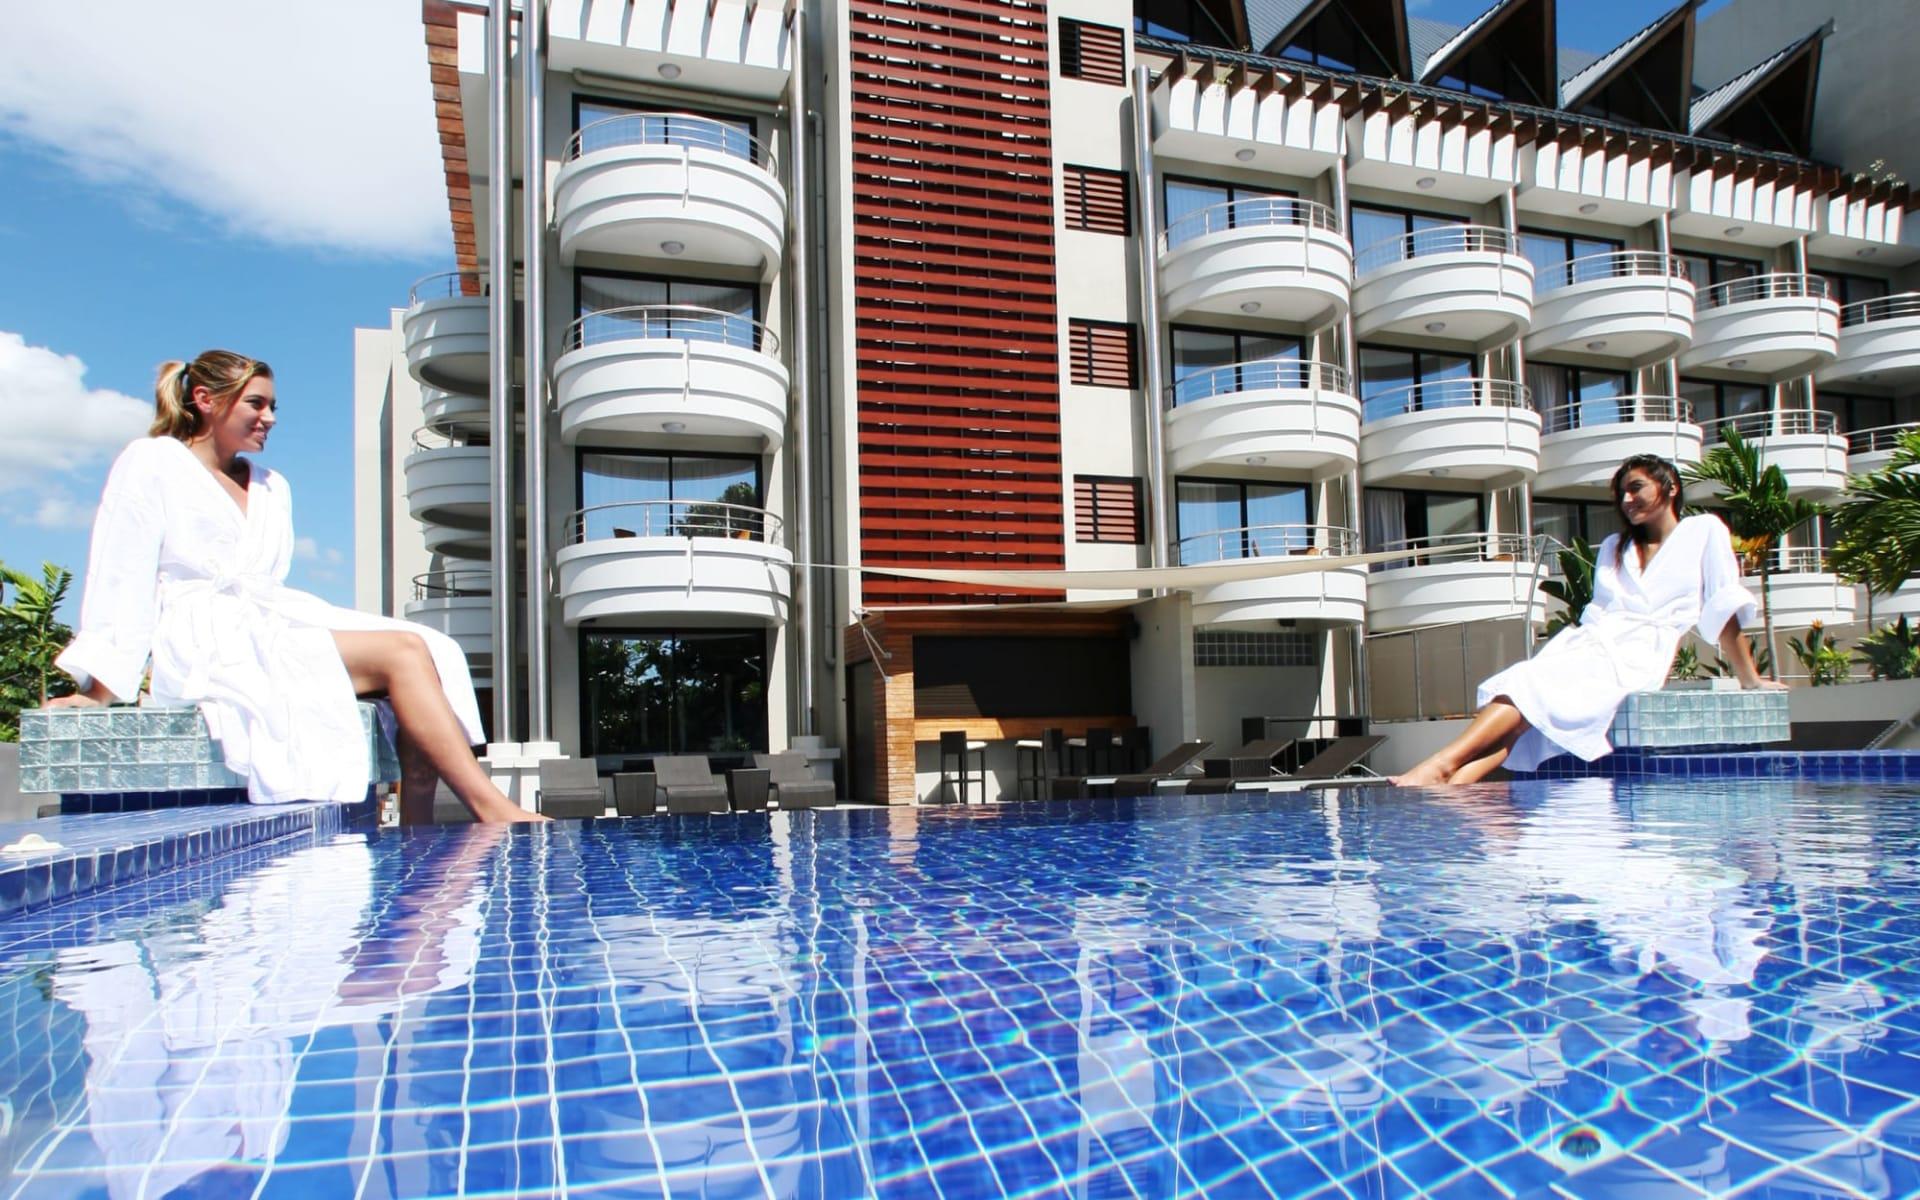 Hotel Tahiti Nui in Papeete:  PPT Hotel Tahiti Nui Swimming Pool (copyright wake-up) (2)